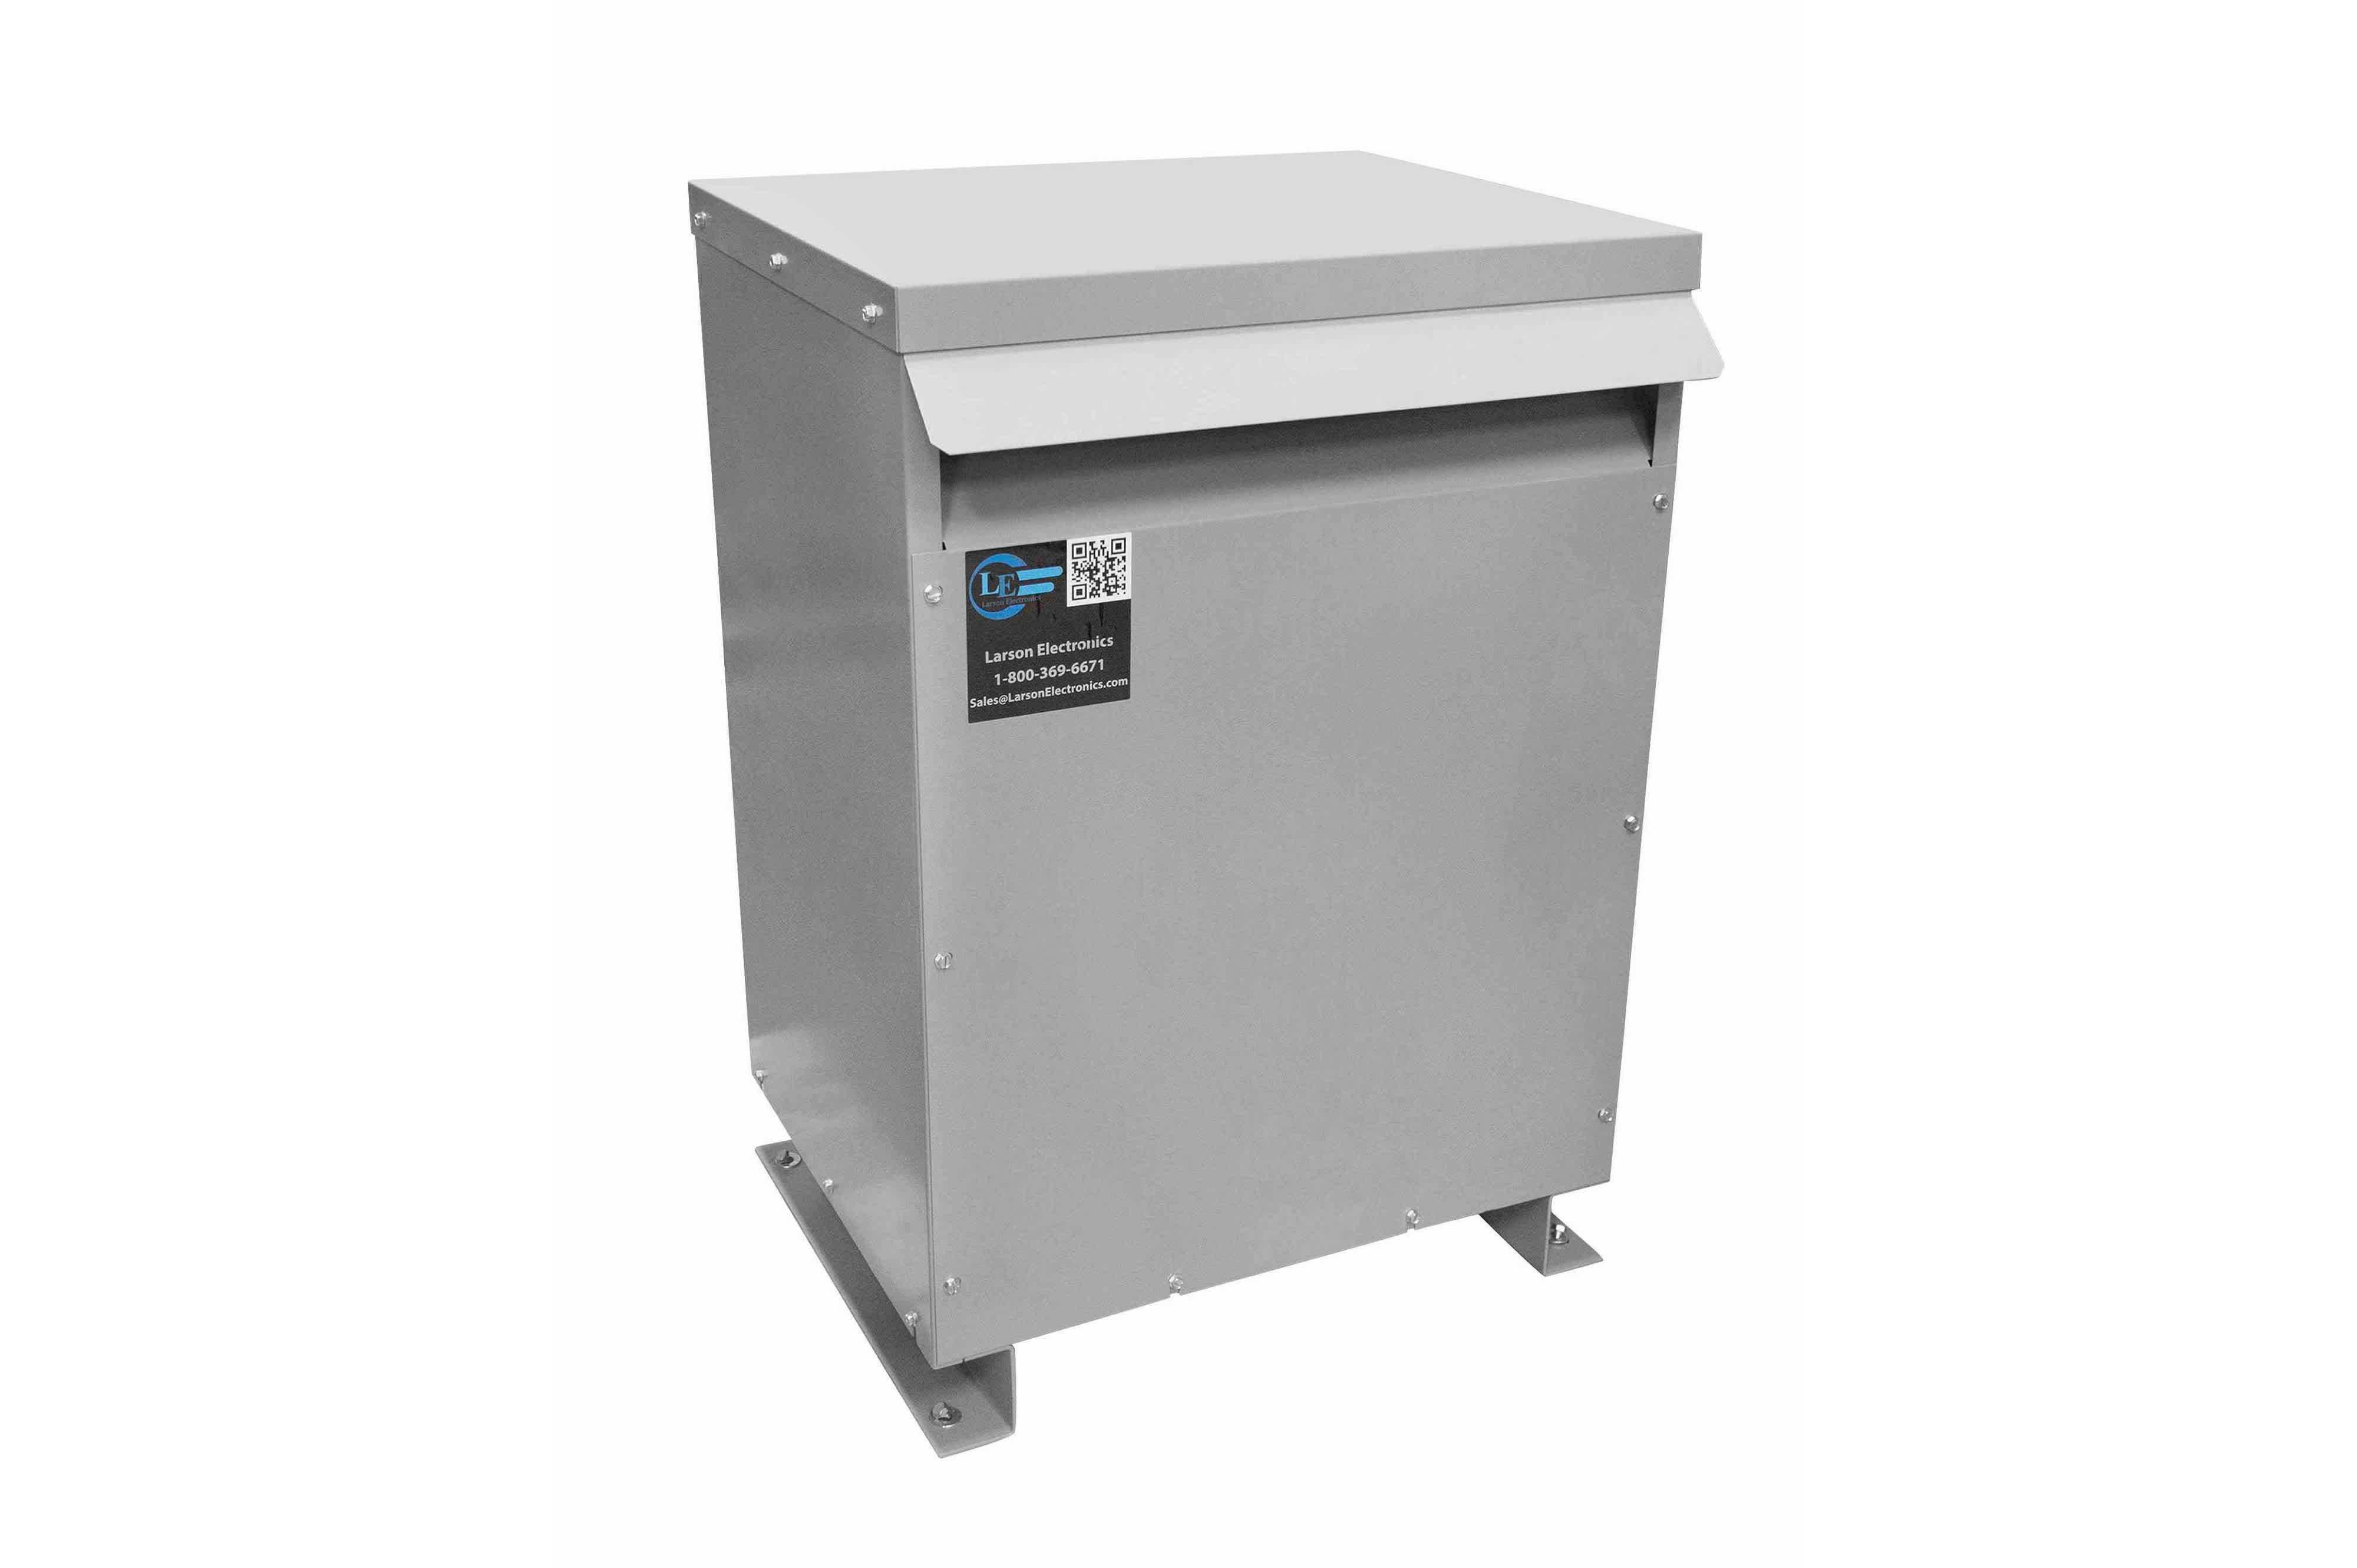 250 kVA 3PH Isolation Transformer, 415V Wye Primary, 240V/120 Delta Secondary, N3R, Ventilated, 60 Hz